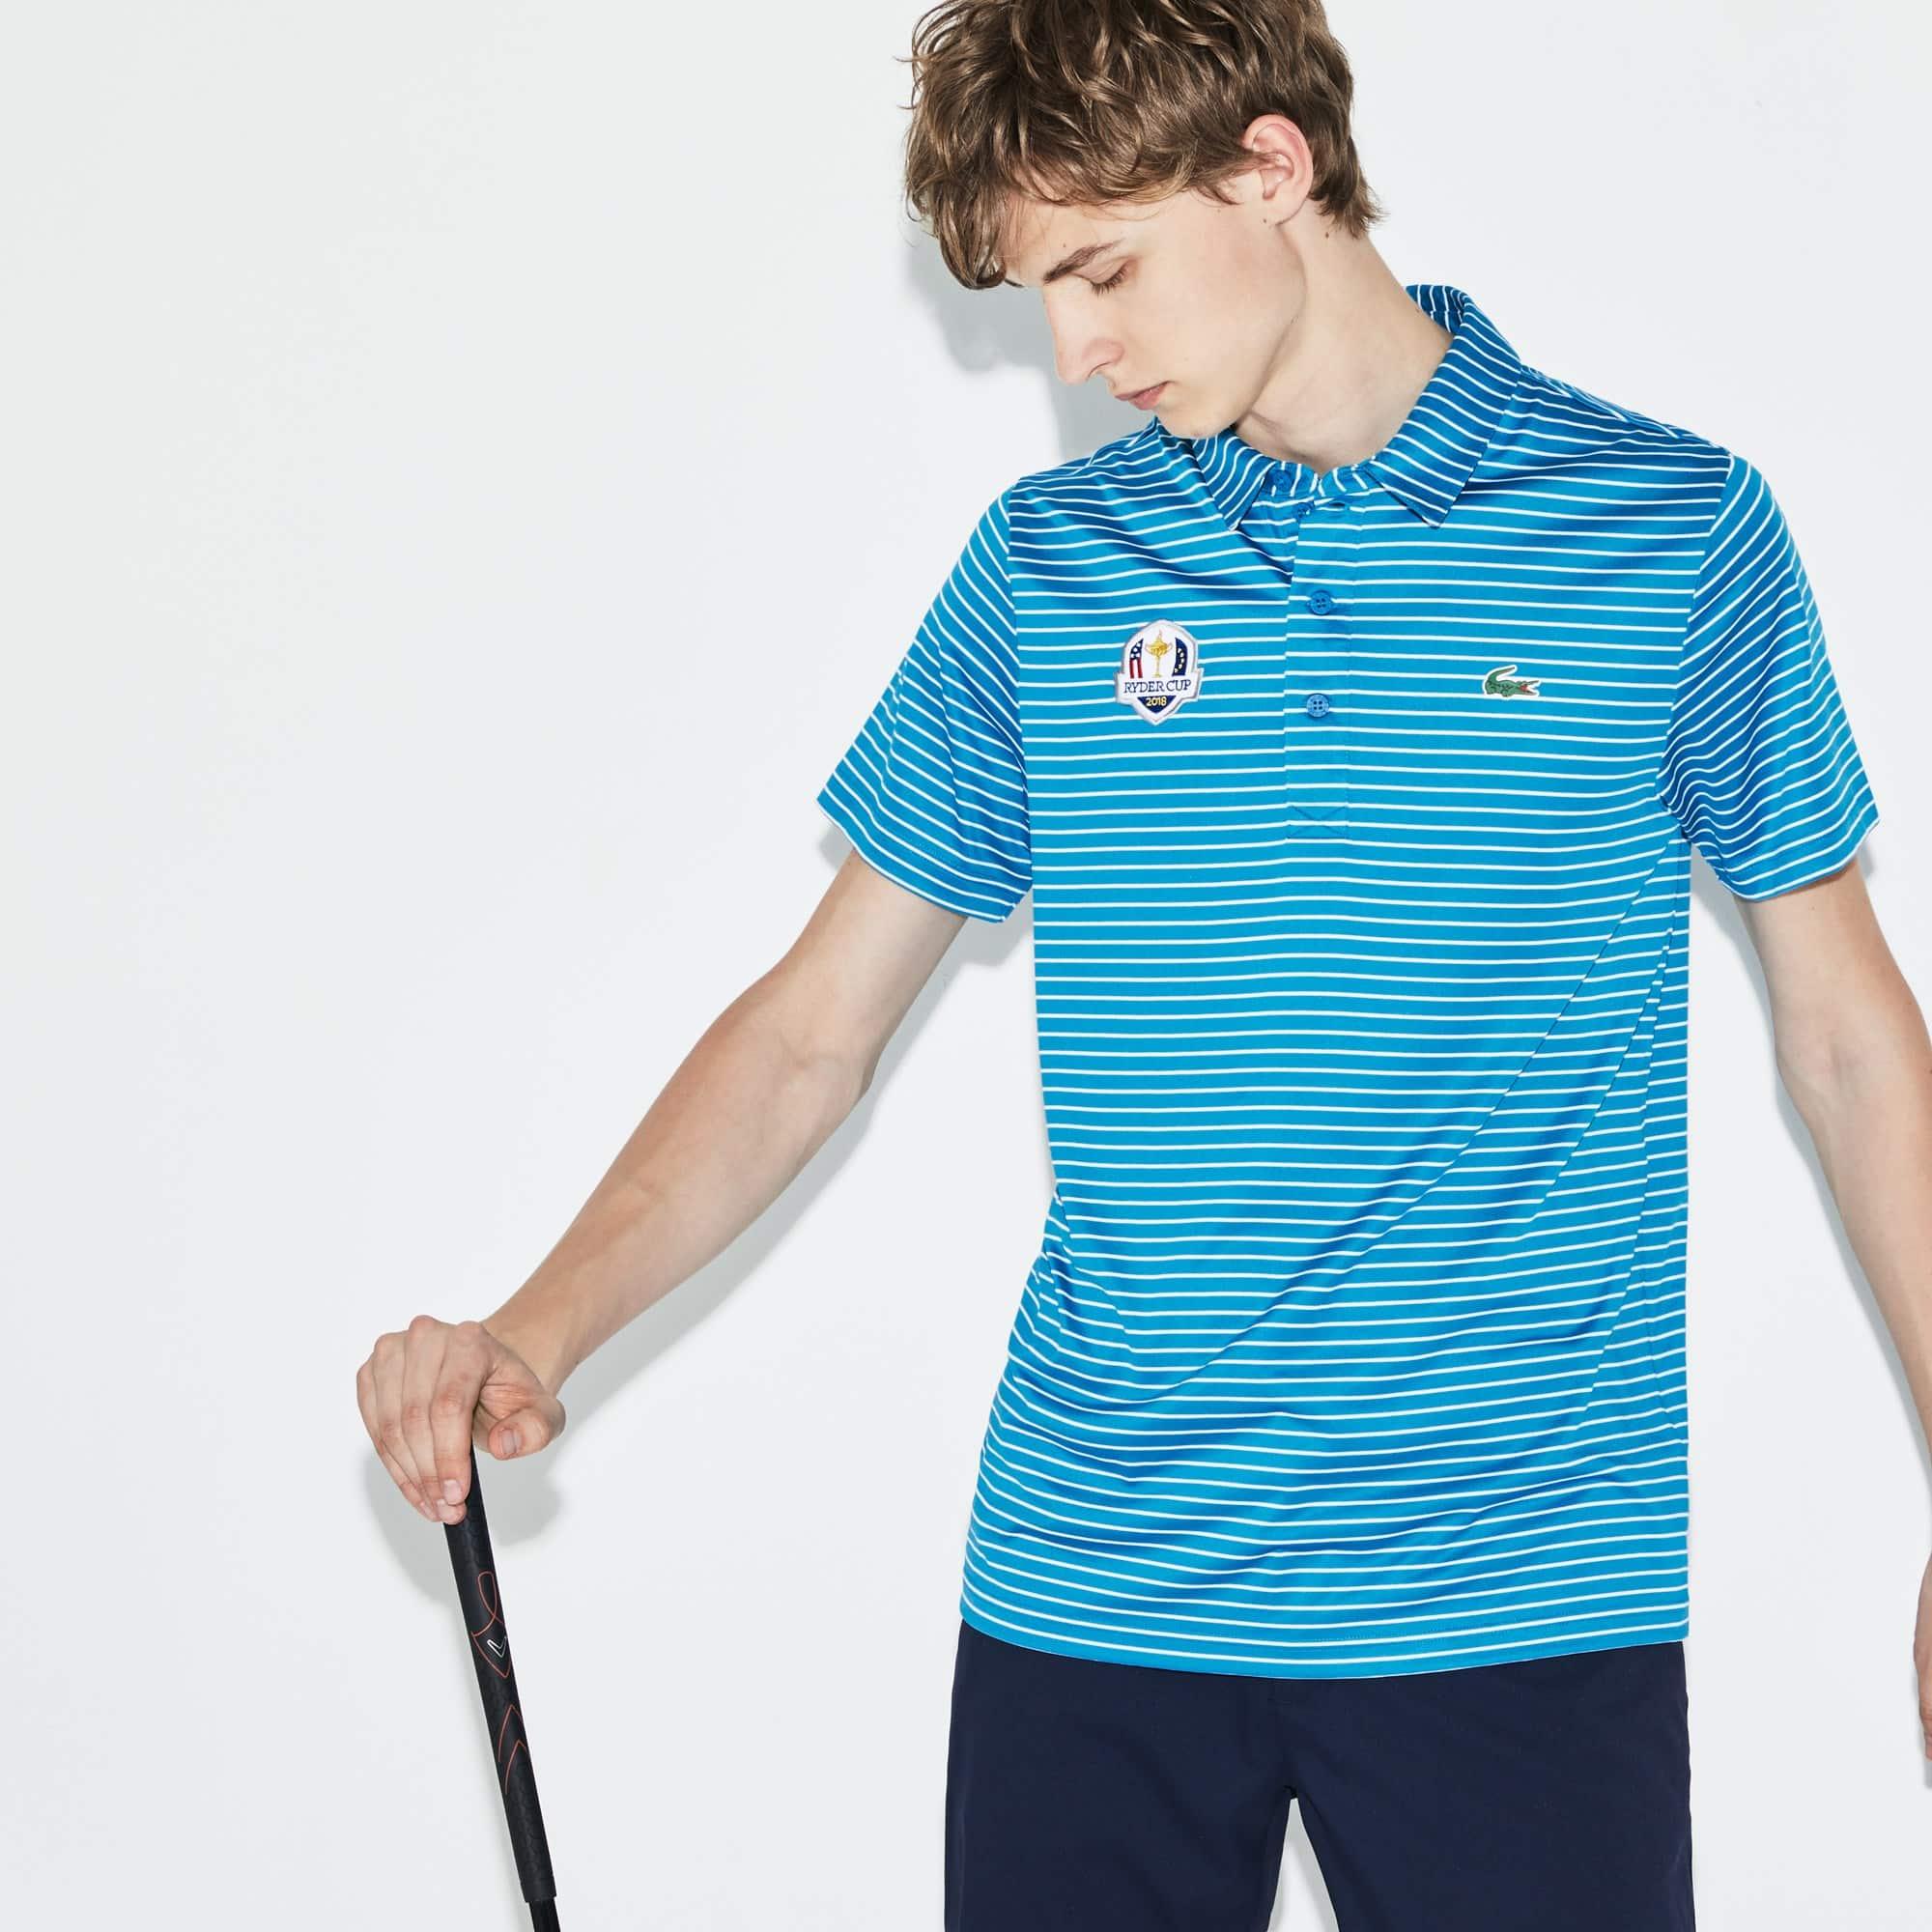 Polo Golf Lacoste SPORT en jersey stretch rayé Édition Ryder Cup